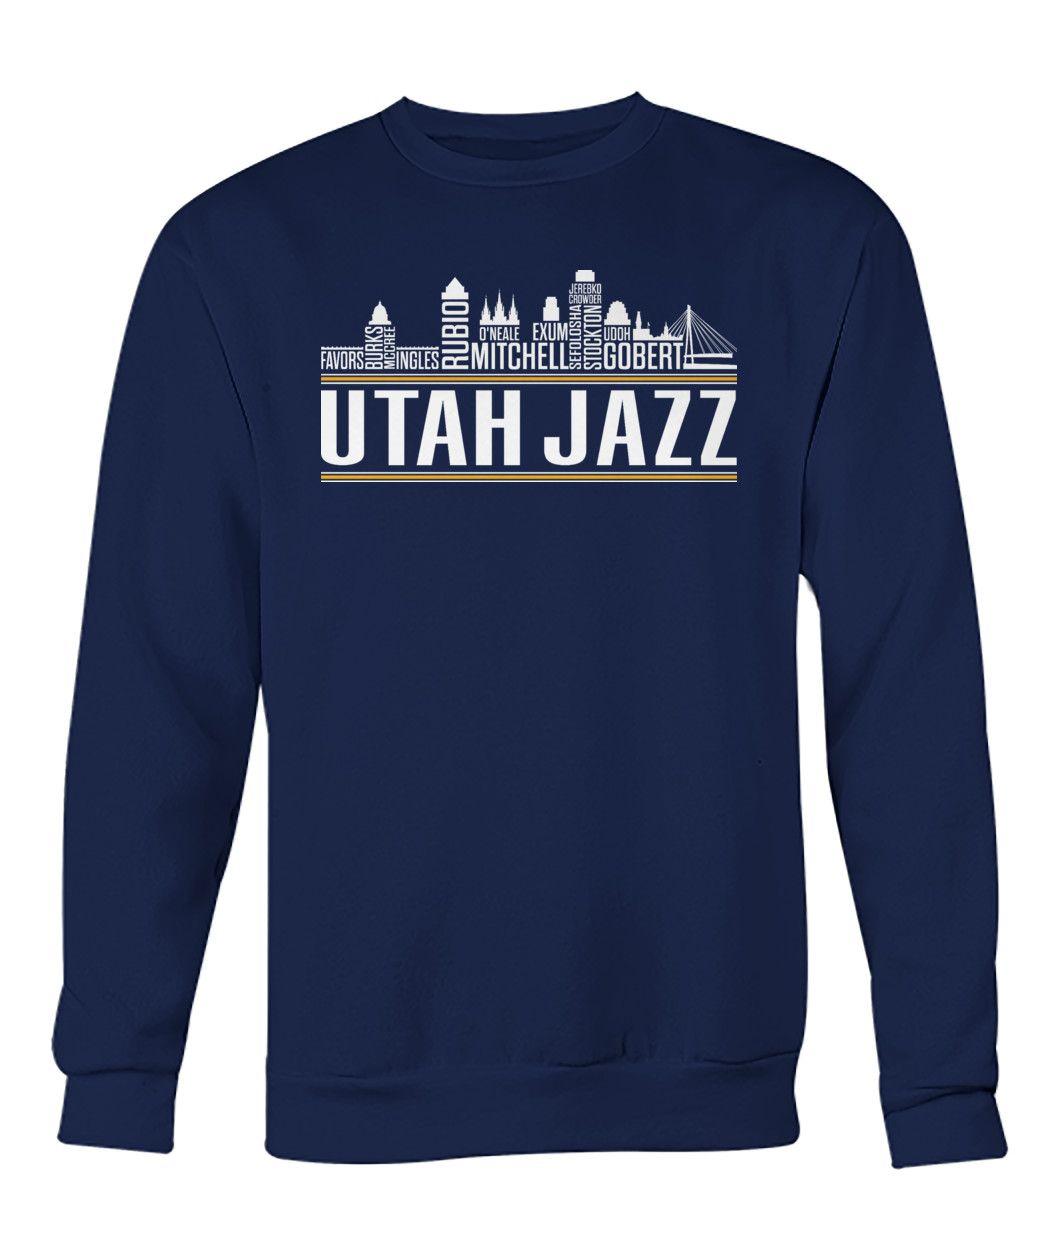 c7ebd044058 Product Front View Utah Jazz